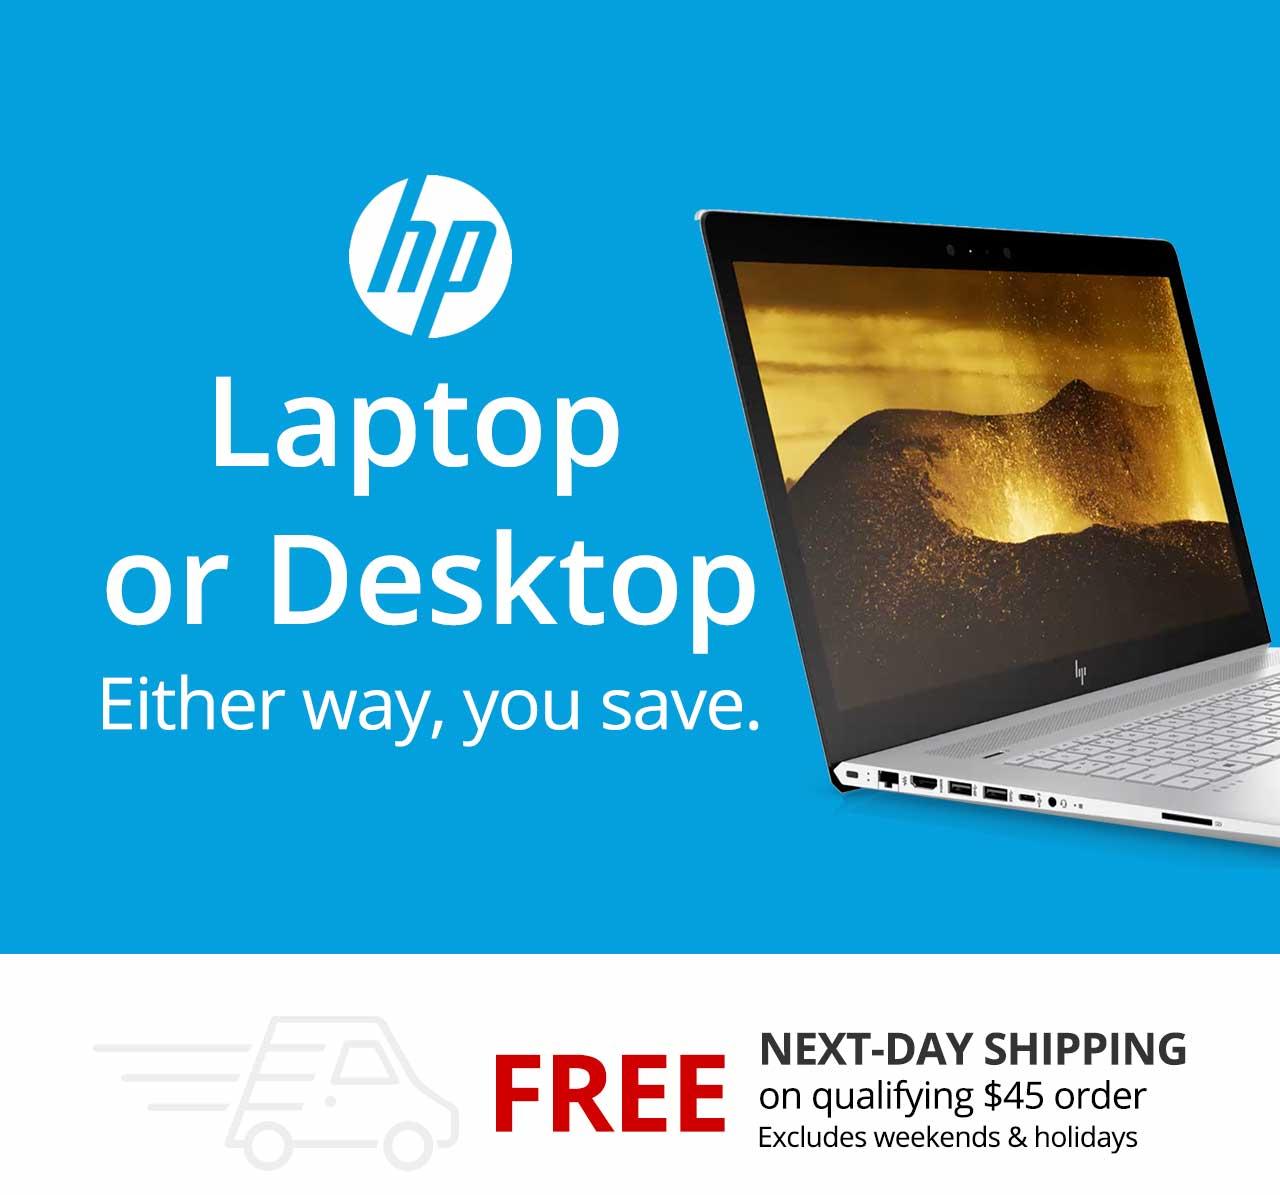 Laptop or Desktop Either way, you save.